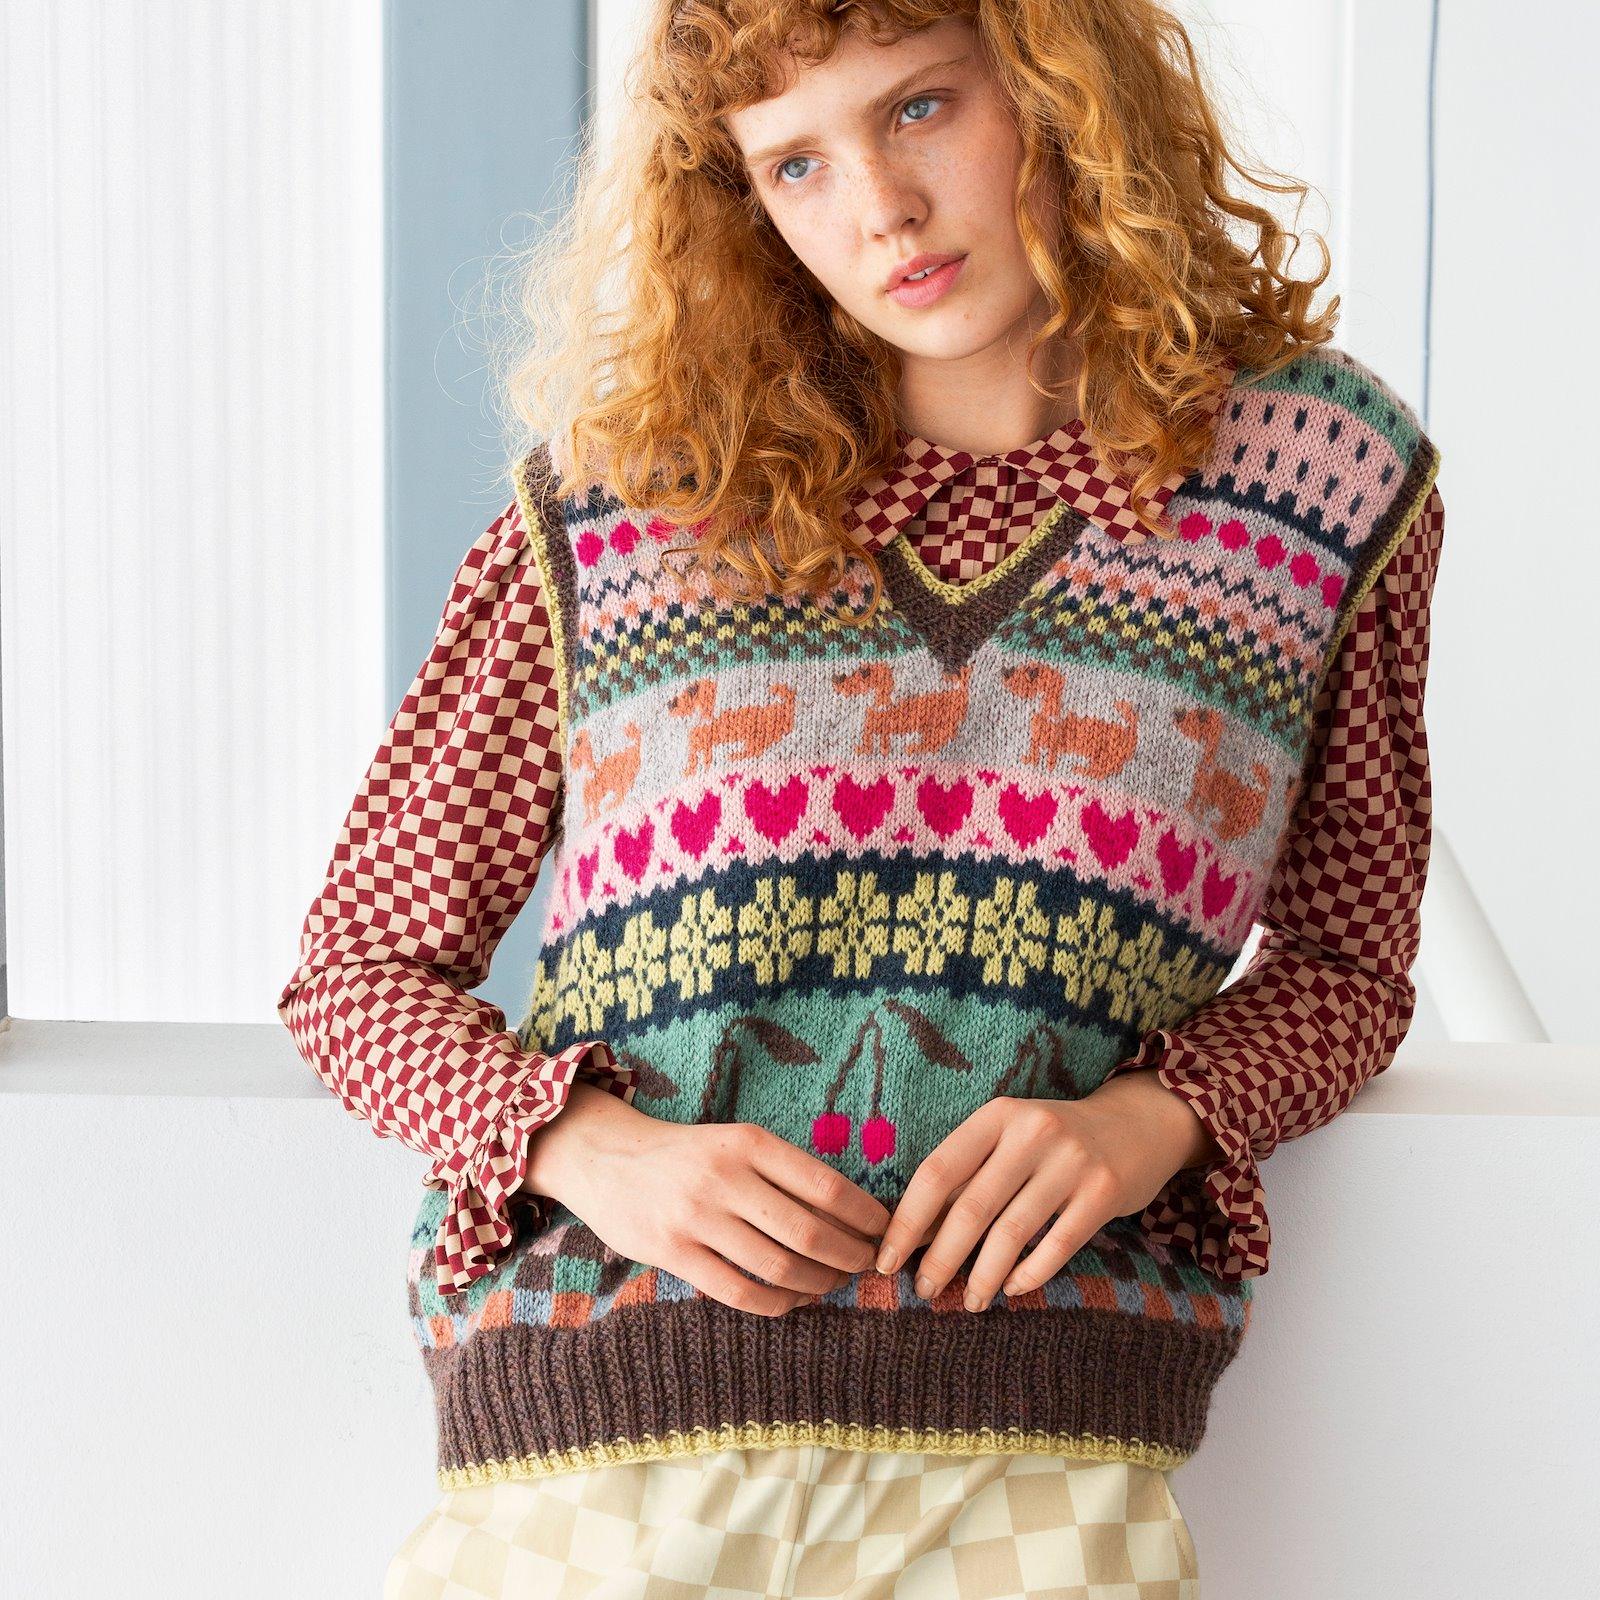 Design your own blouse, 46/18 FRAYA2037_p22075_710666__sskit